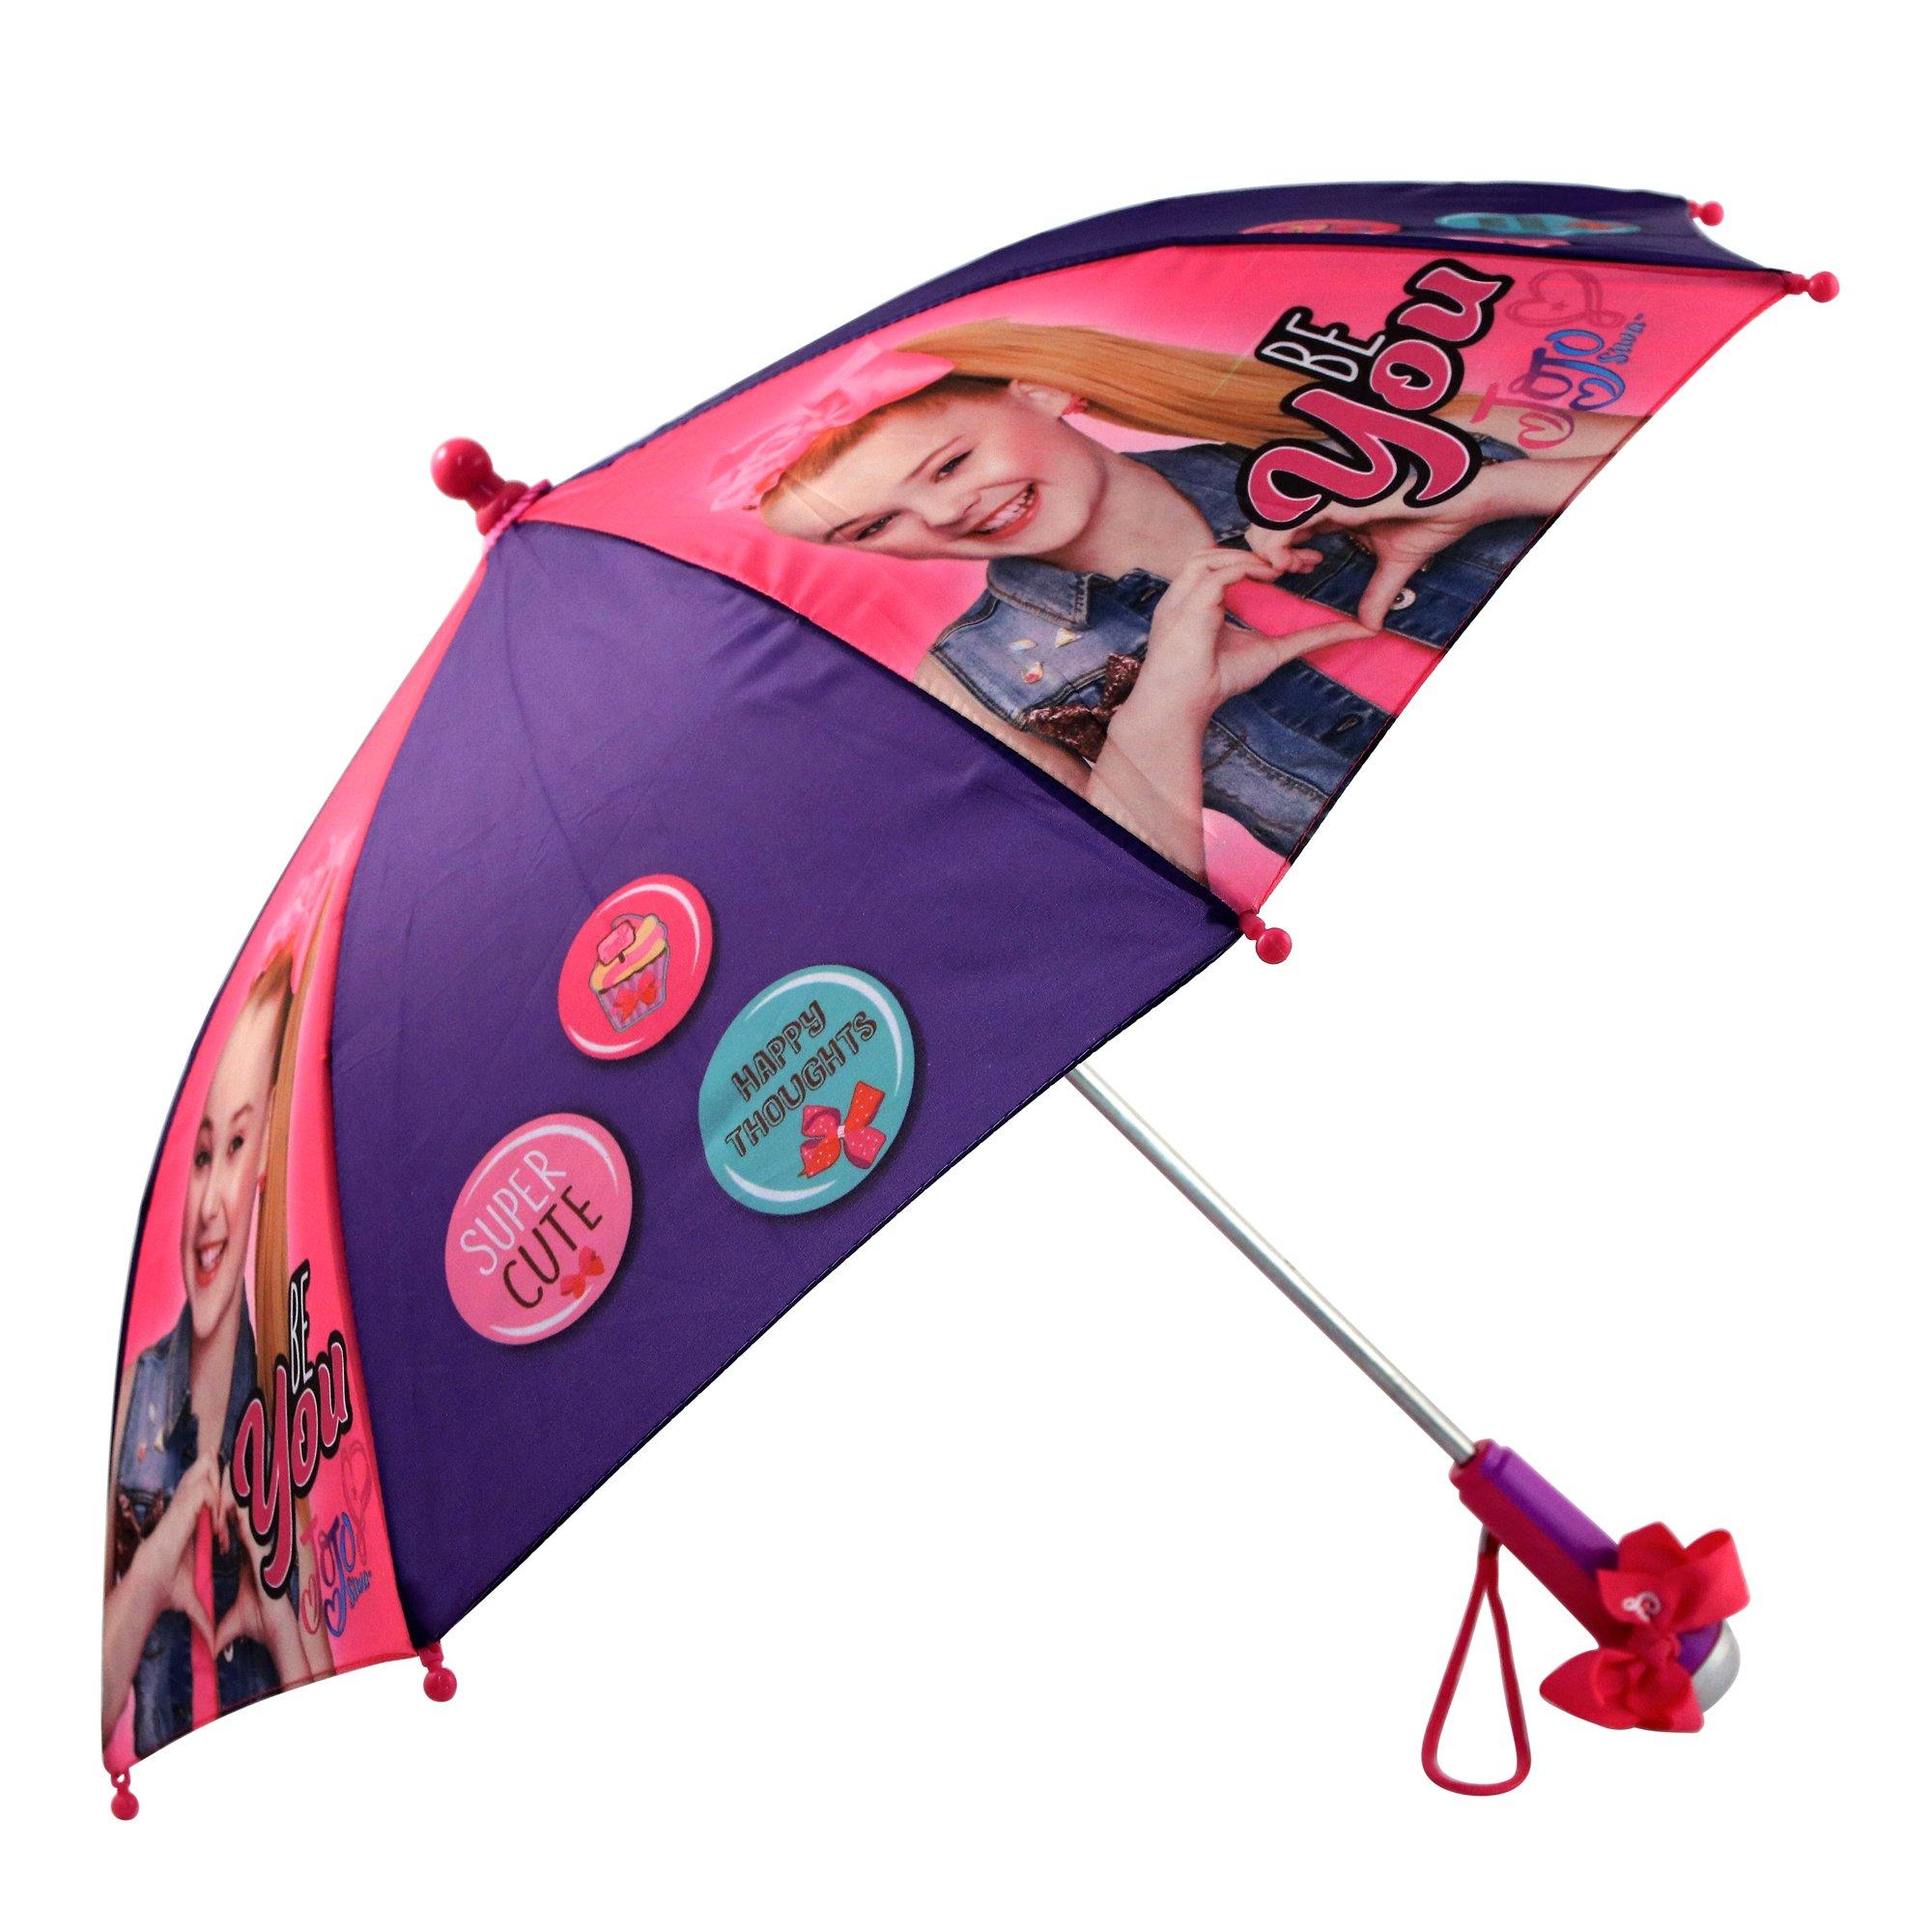 Nickelodeon Little Girls' Jojo Siwa Rainwear Character Umbrella, Purple/Pink, Age 3-7 by Nickelodeon (Image #1)